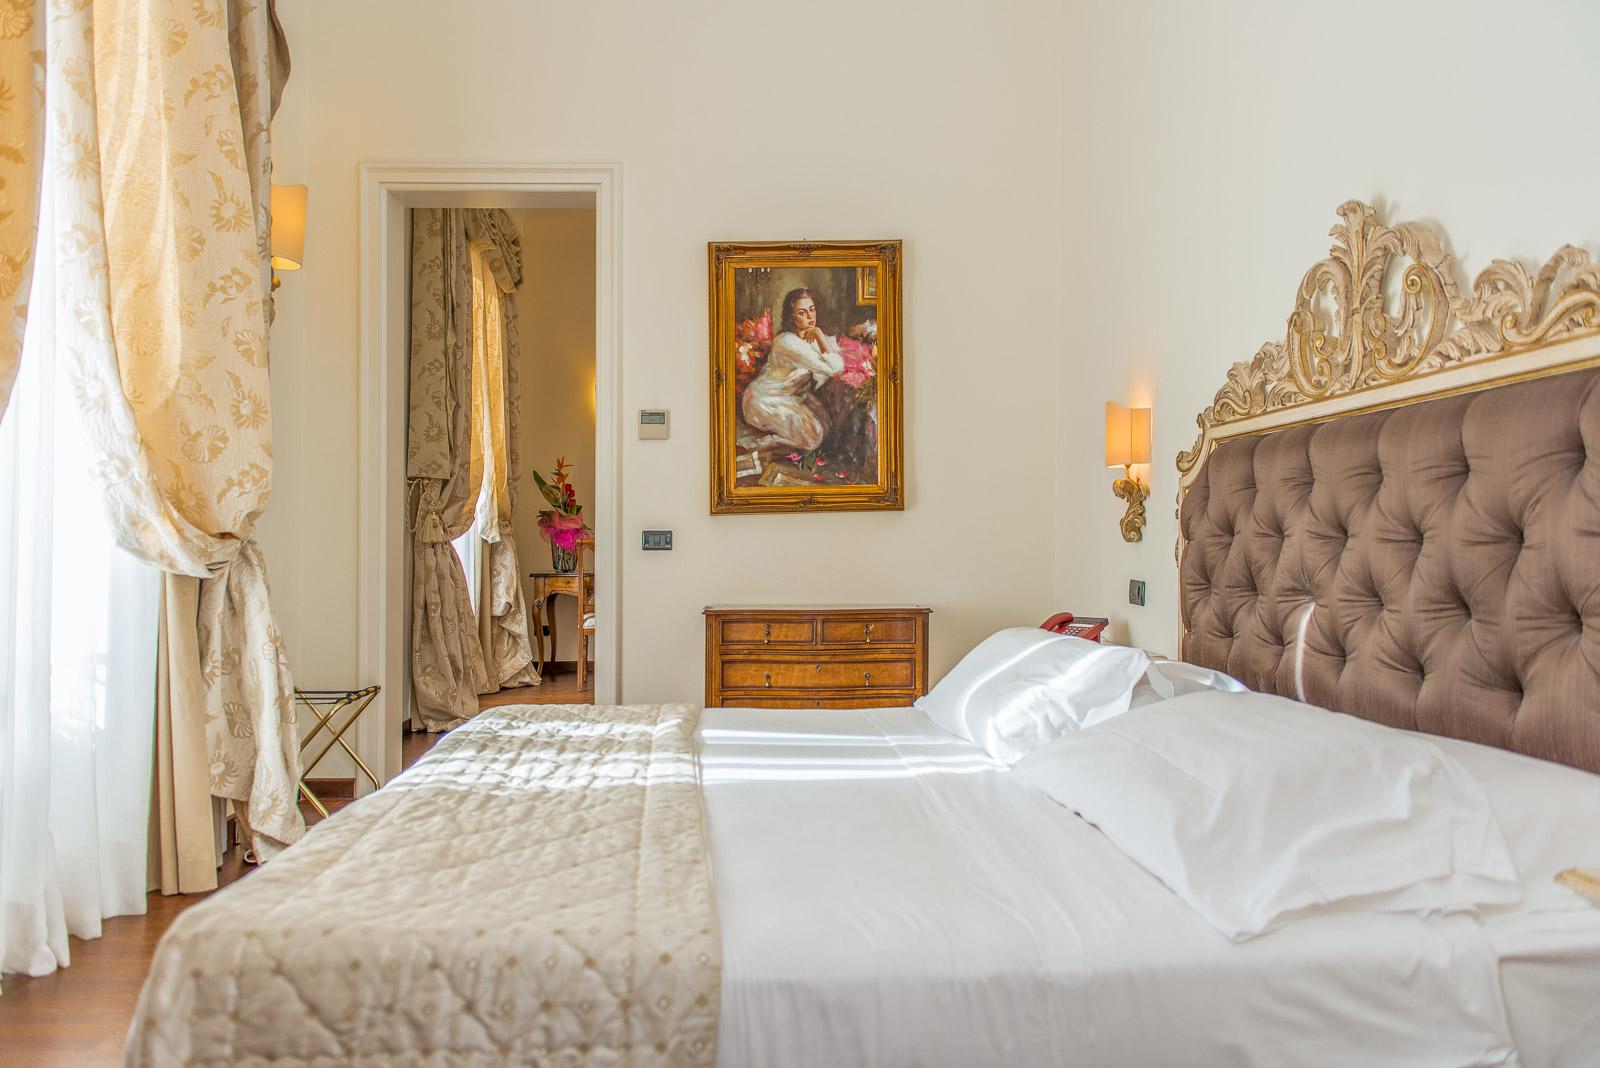 https://www.orlandinifrancesco.com/wp/wp-content/uploads/2018/09/Grand-Hotel-Lecce-3-0.jpg